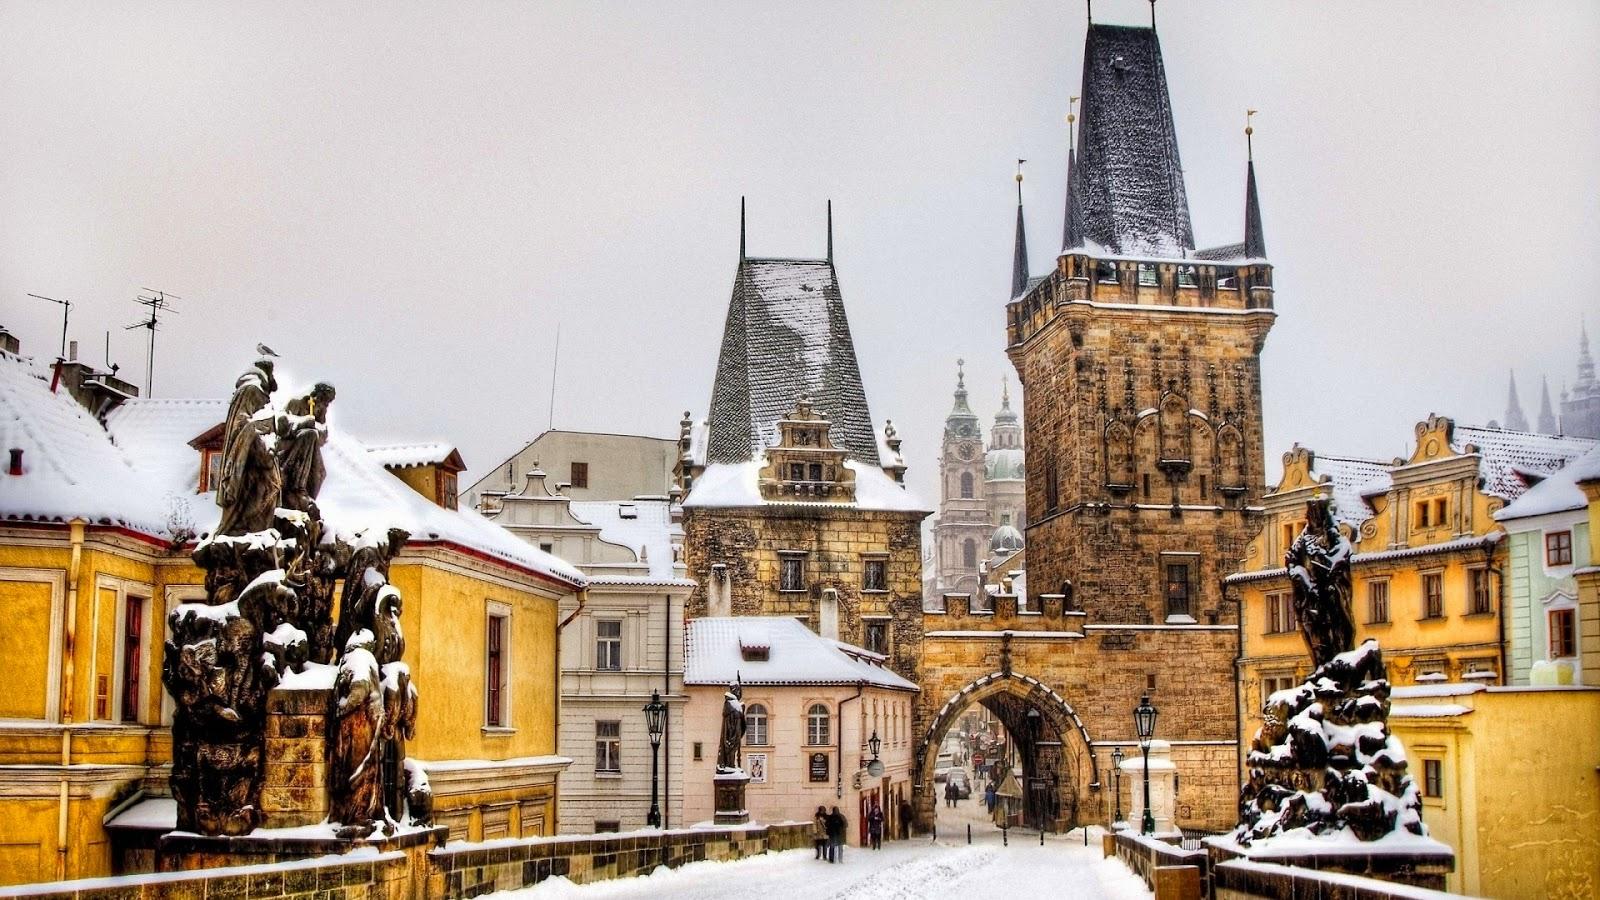 5 gorodov gde stoit provesti romanticheskie vyhodnye 5 5 городов, где стоит провести романтические выходные